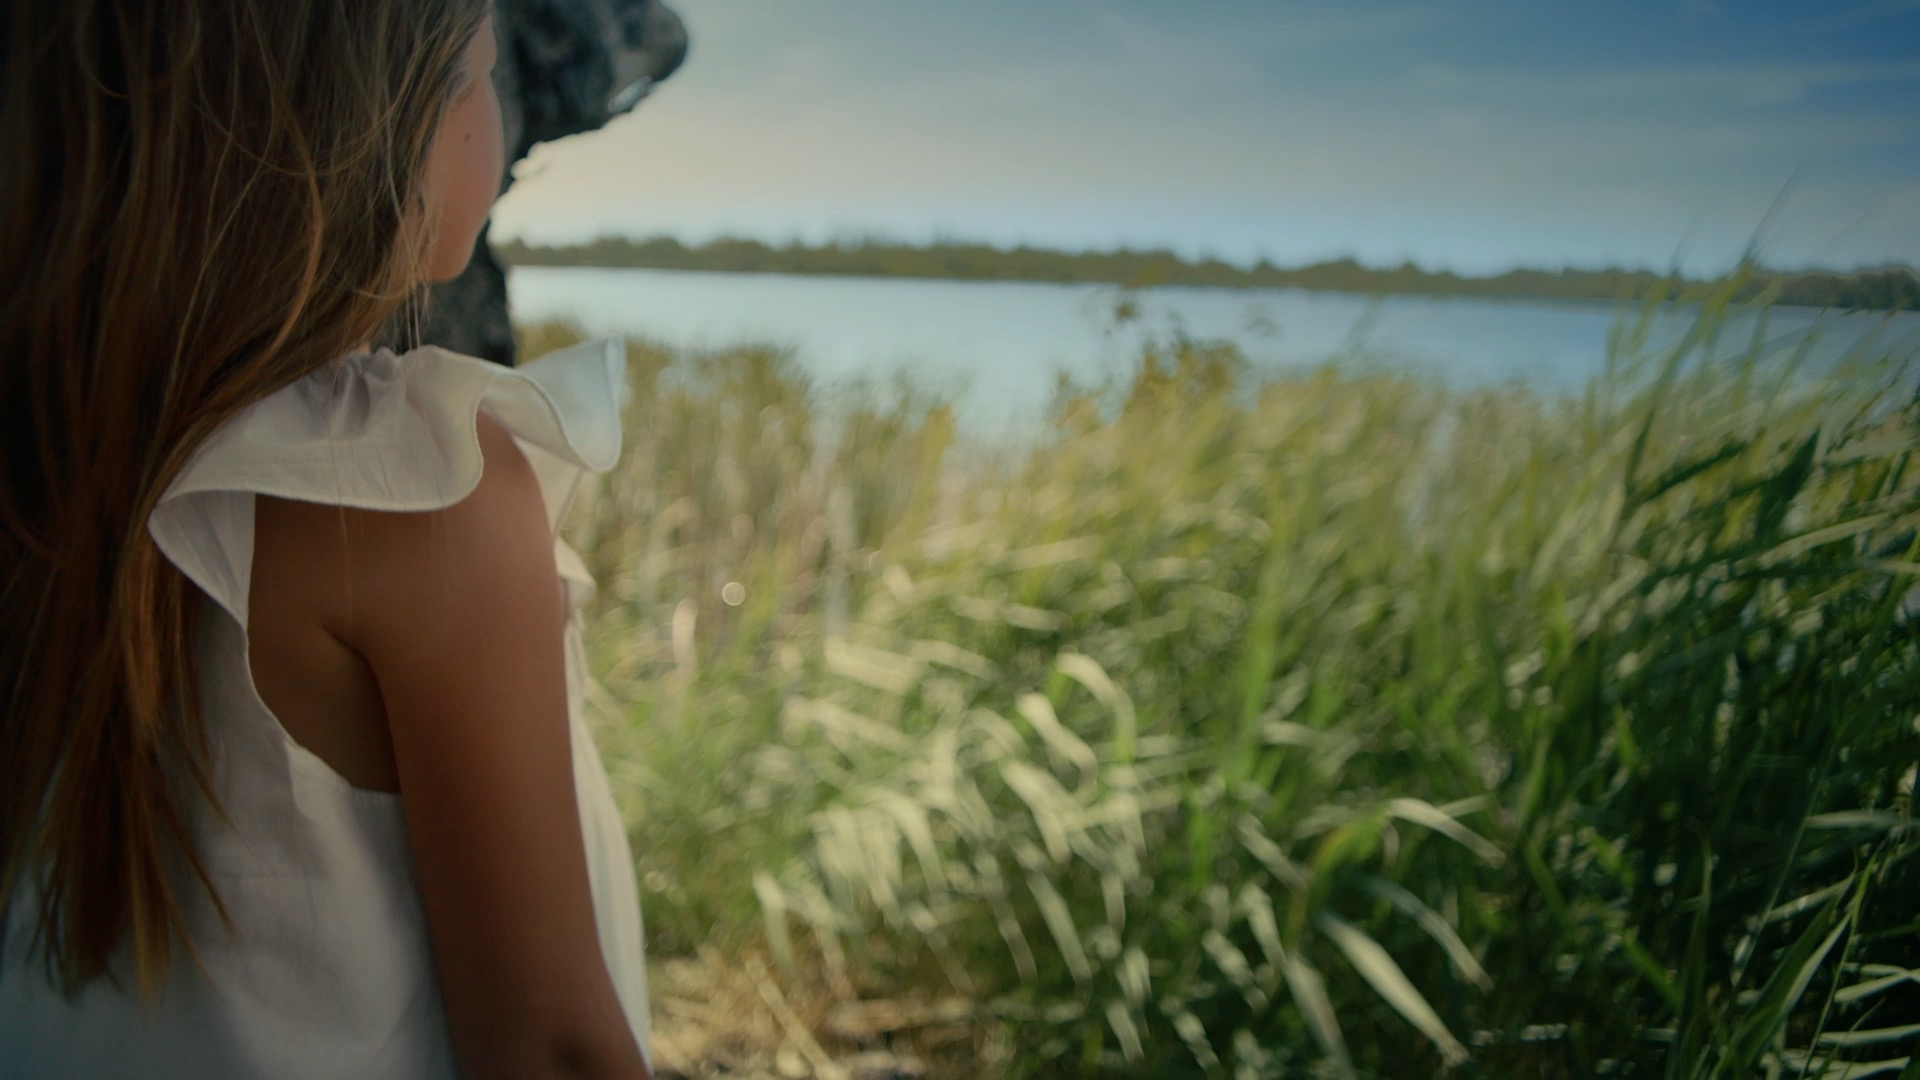 Video Production Melbourne | Video Production Company Melbourne